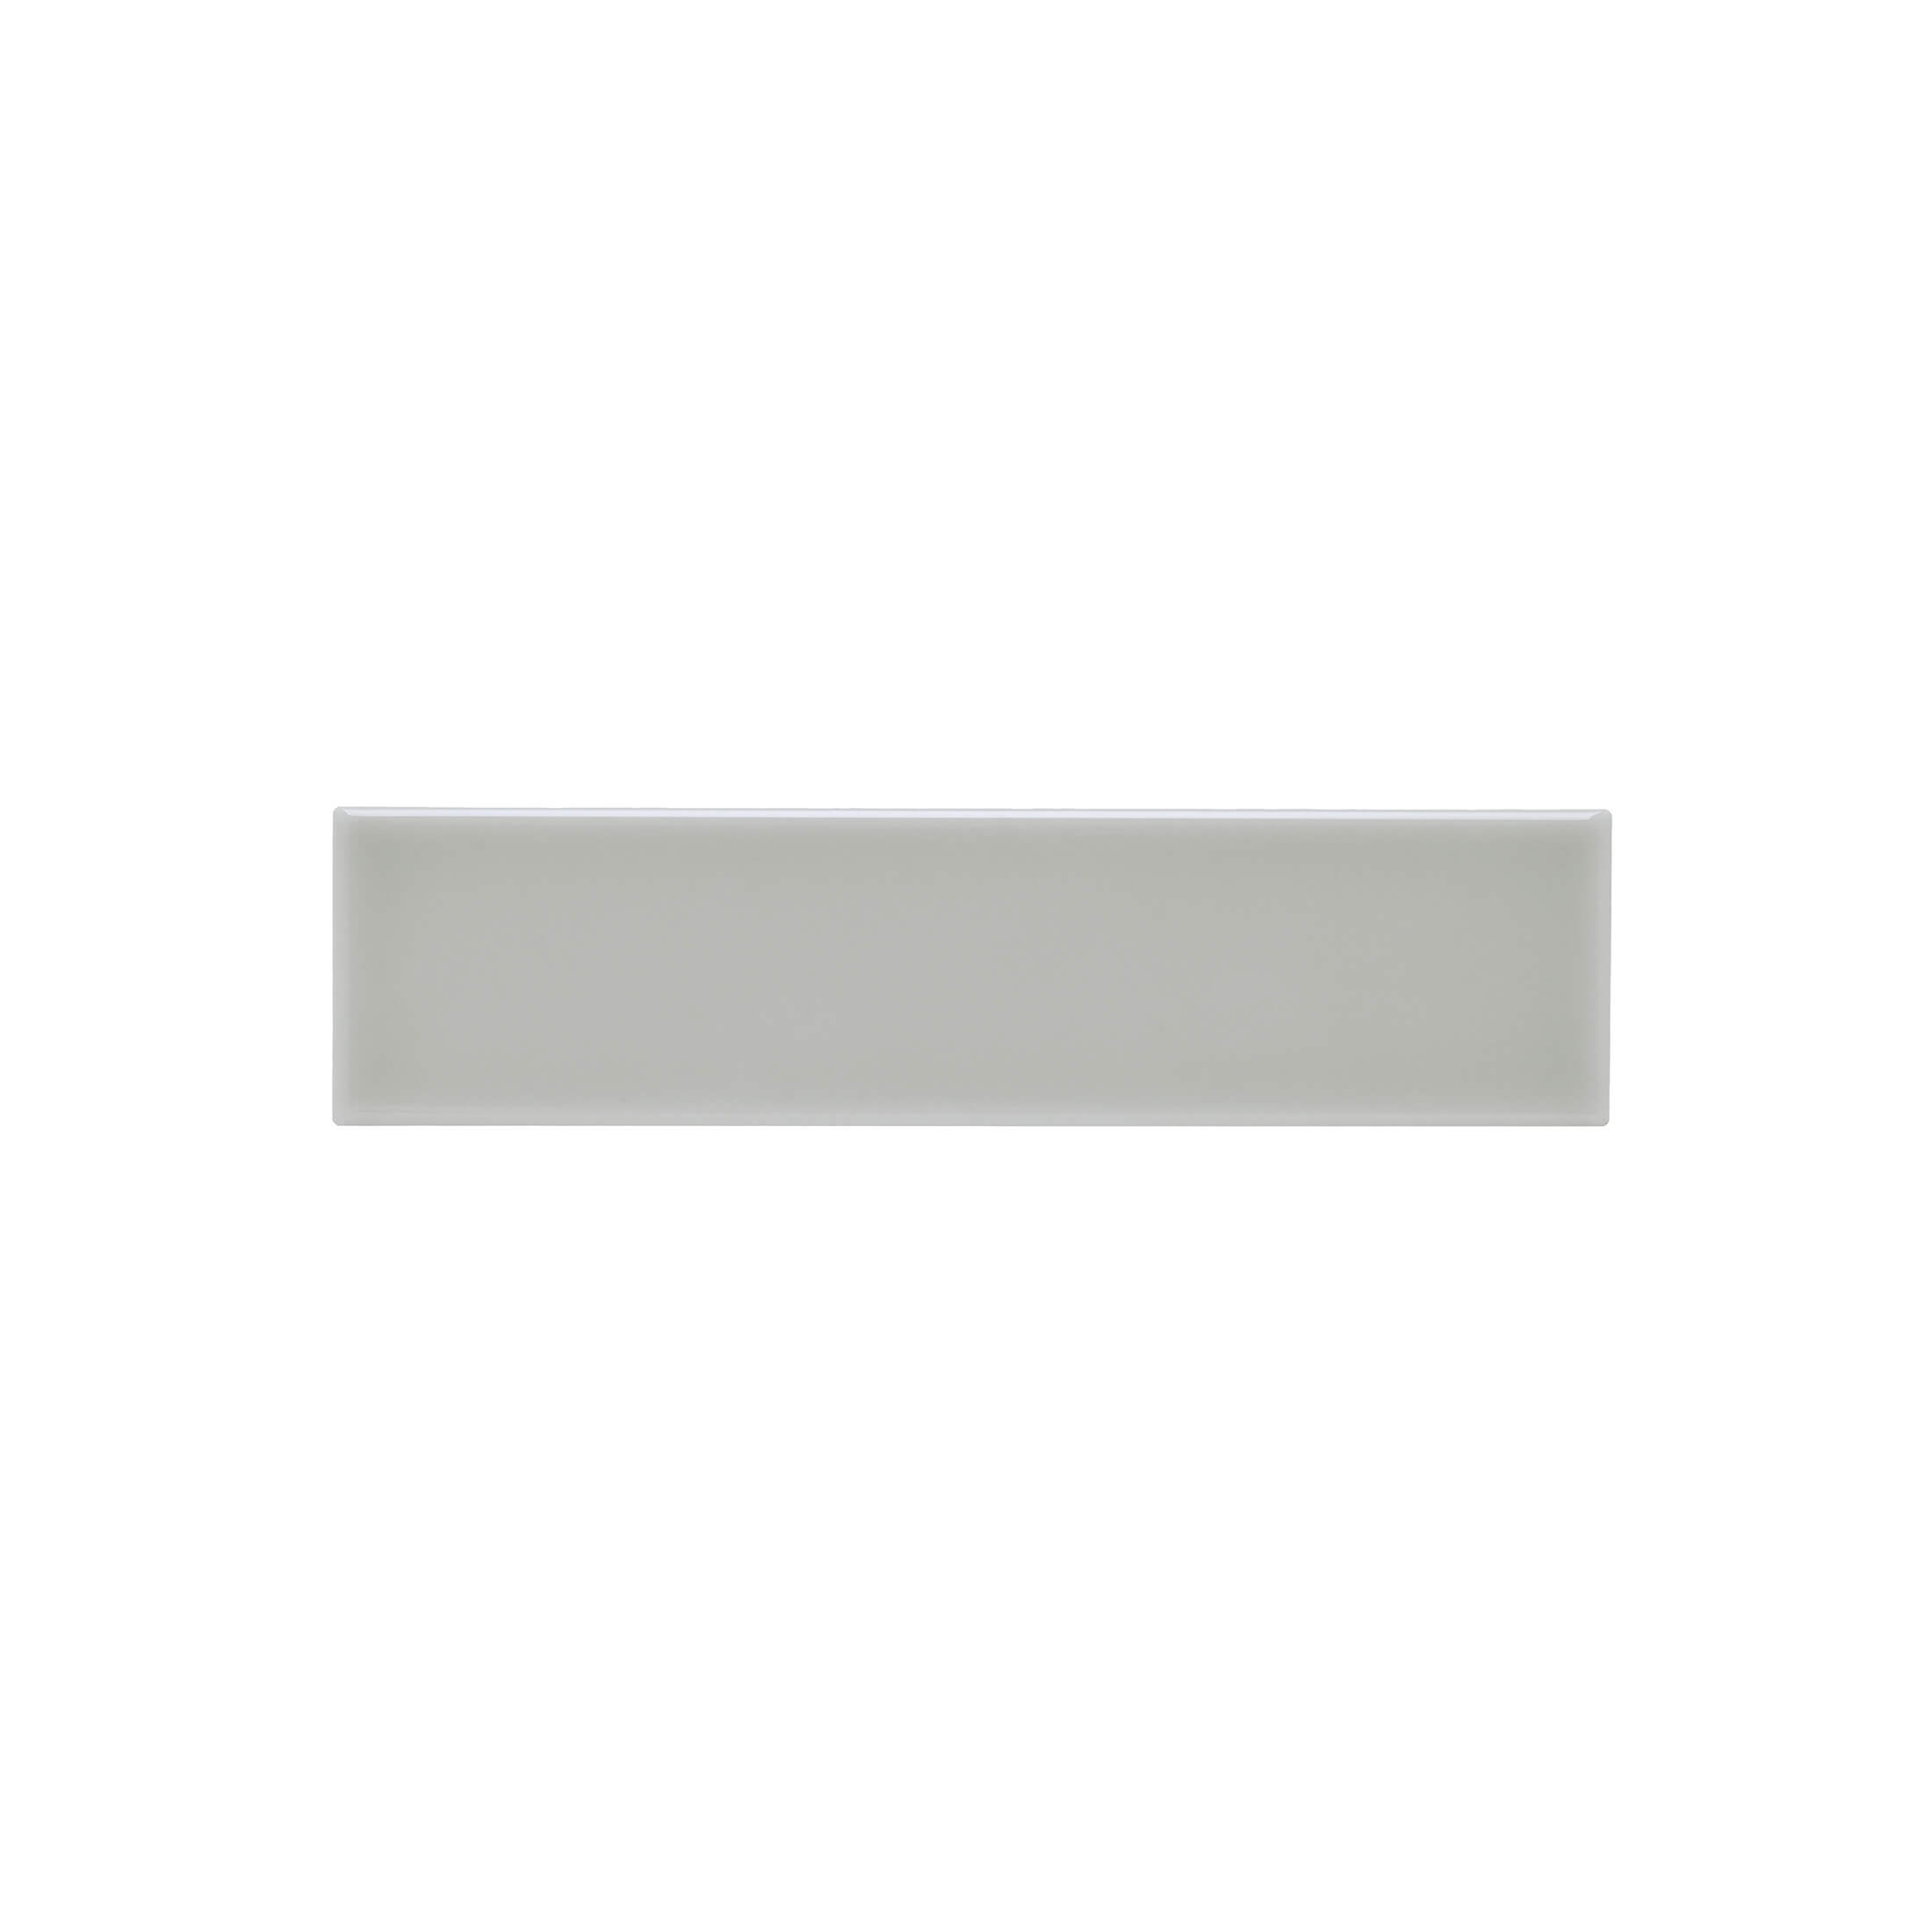 ADNE1096 - LISO PB - 5 cm X 20 cm